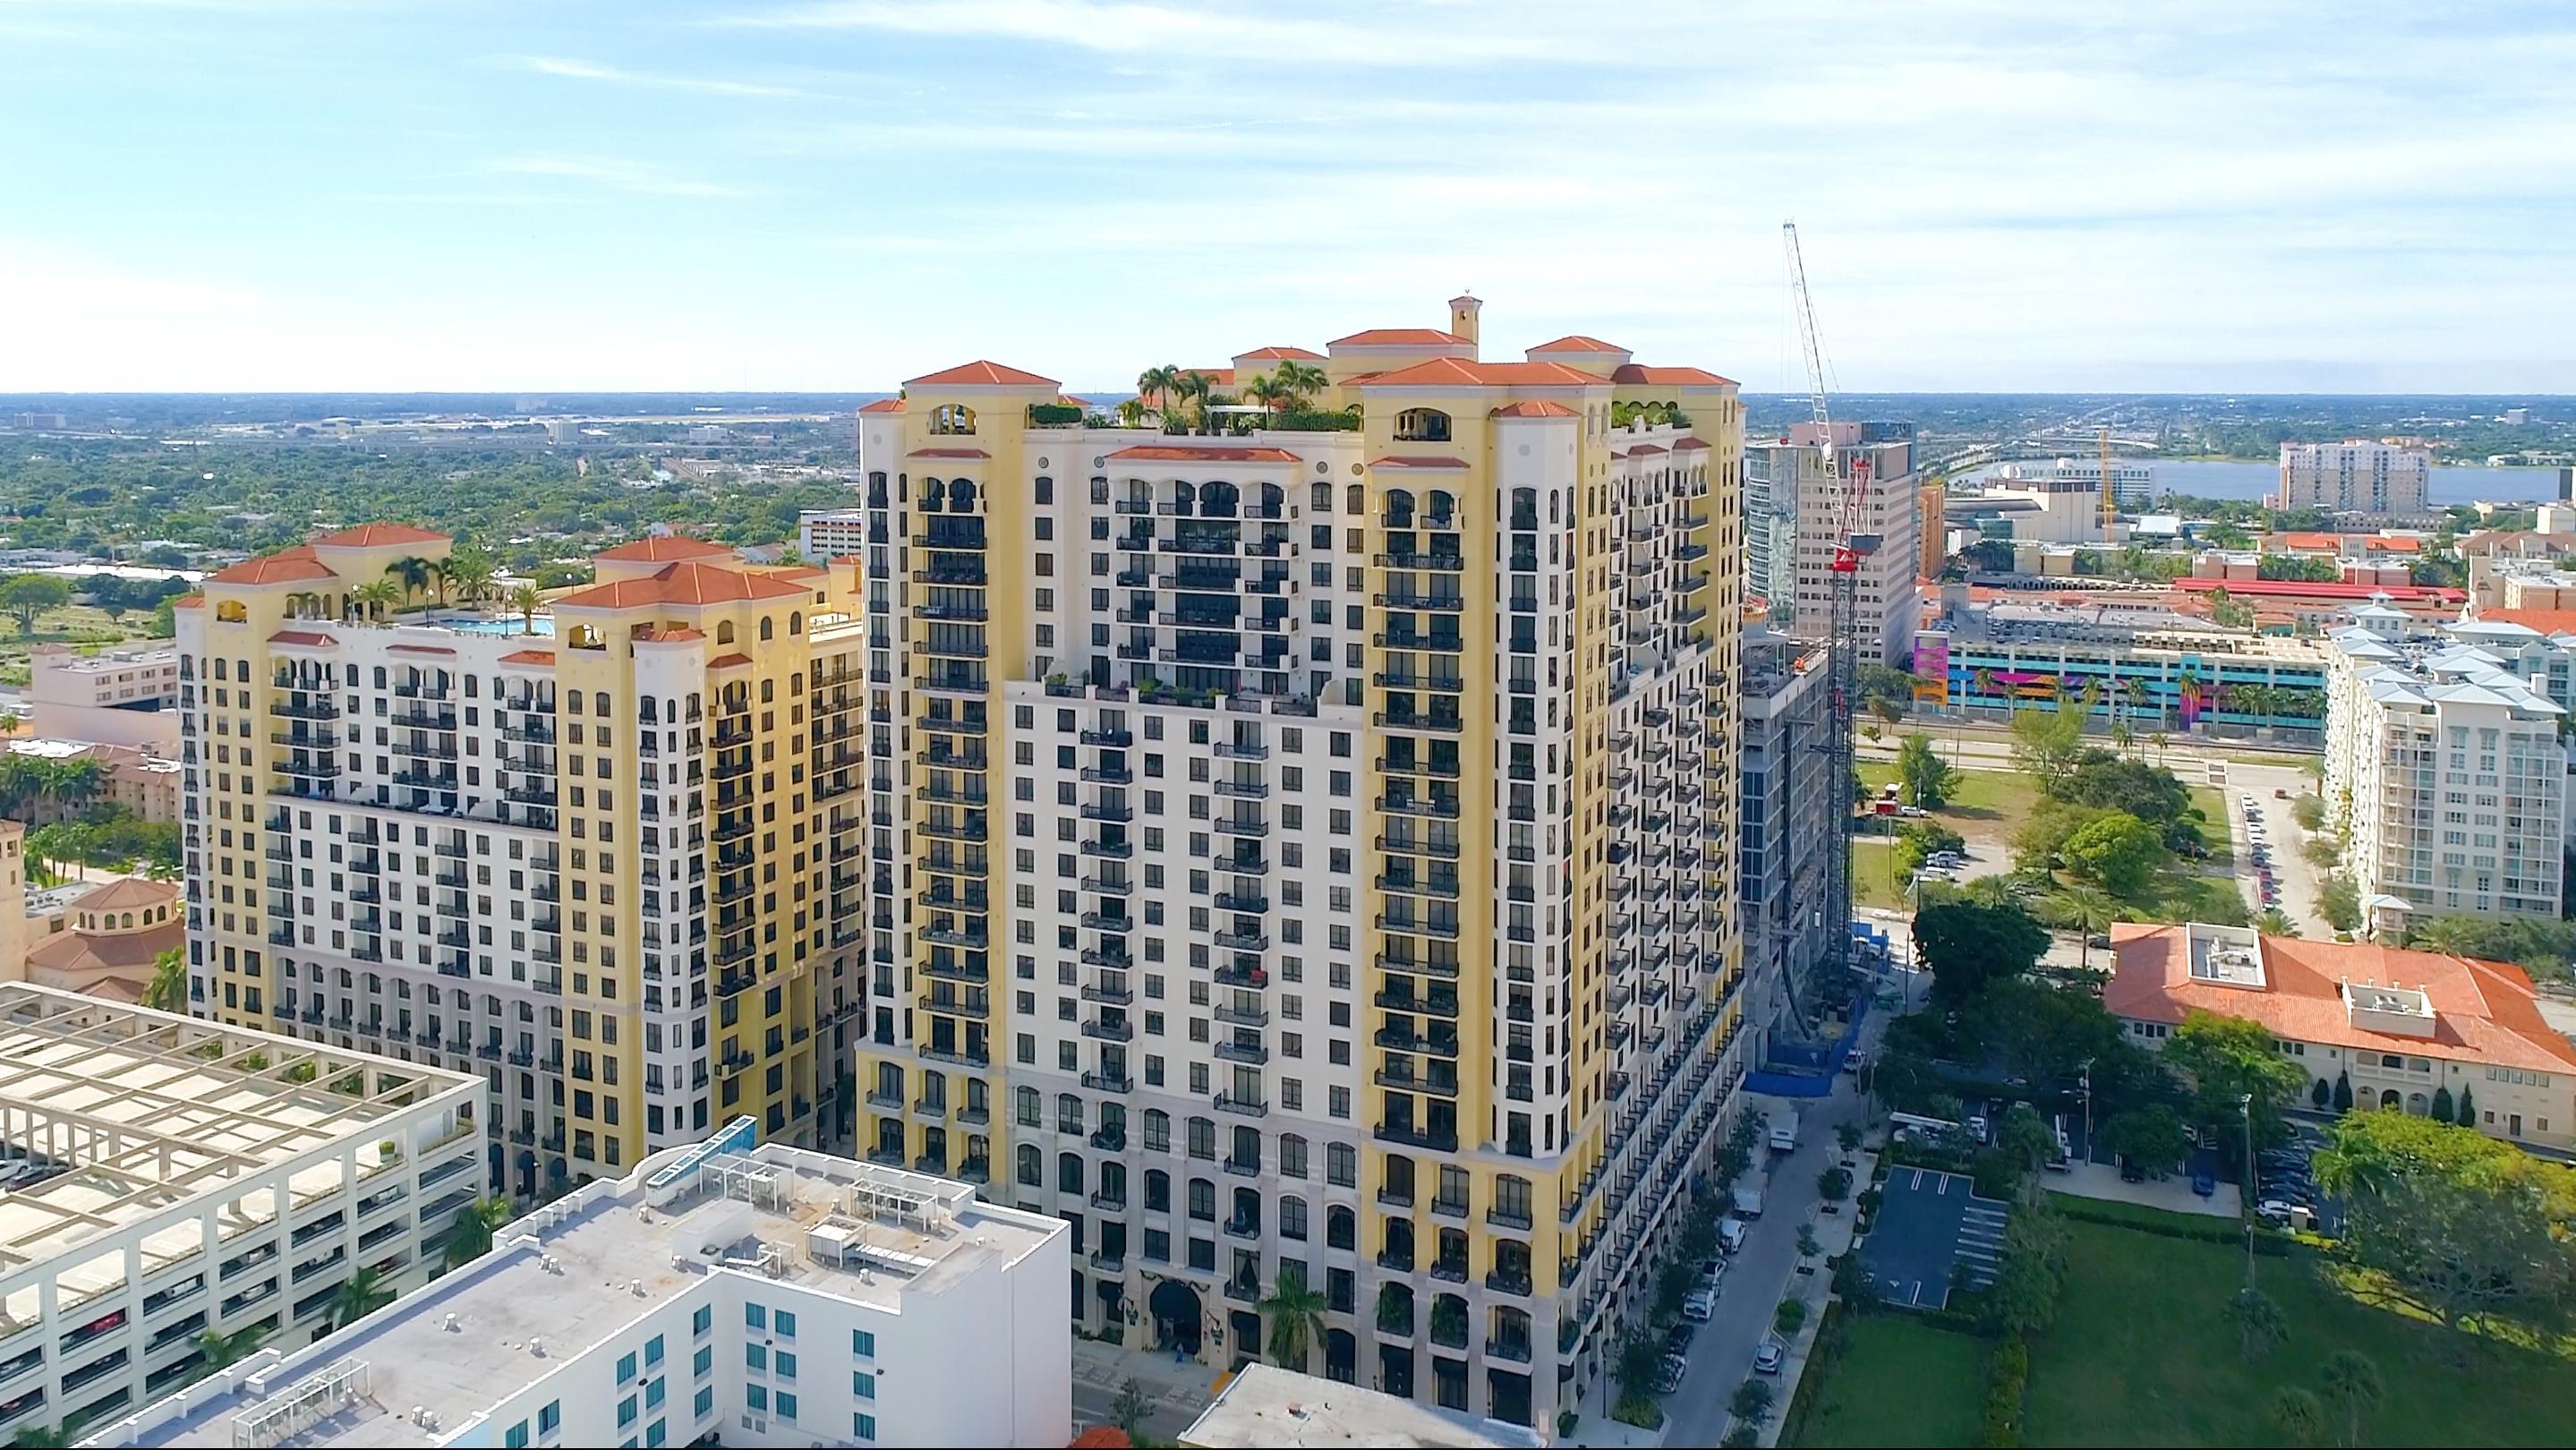 701 S Olive Avenue 1003 West Palm Beach, FL 33401